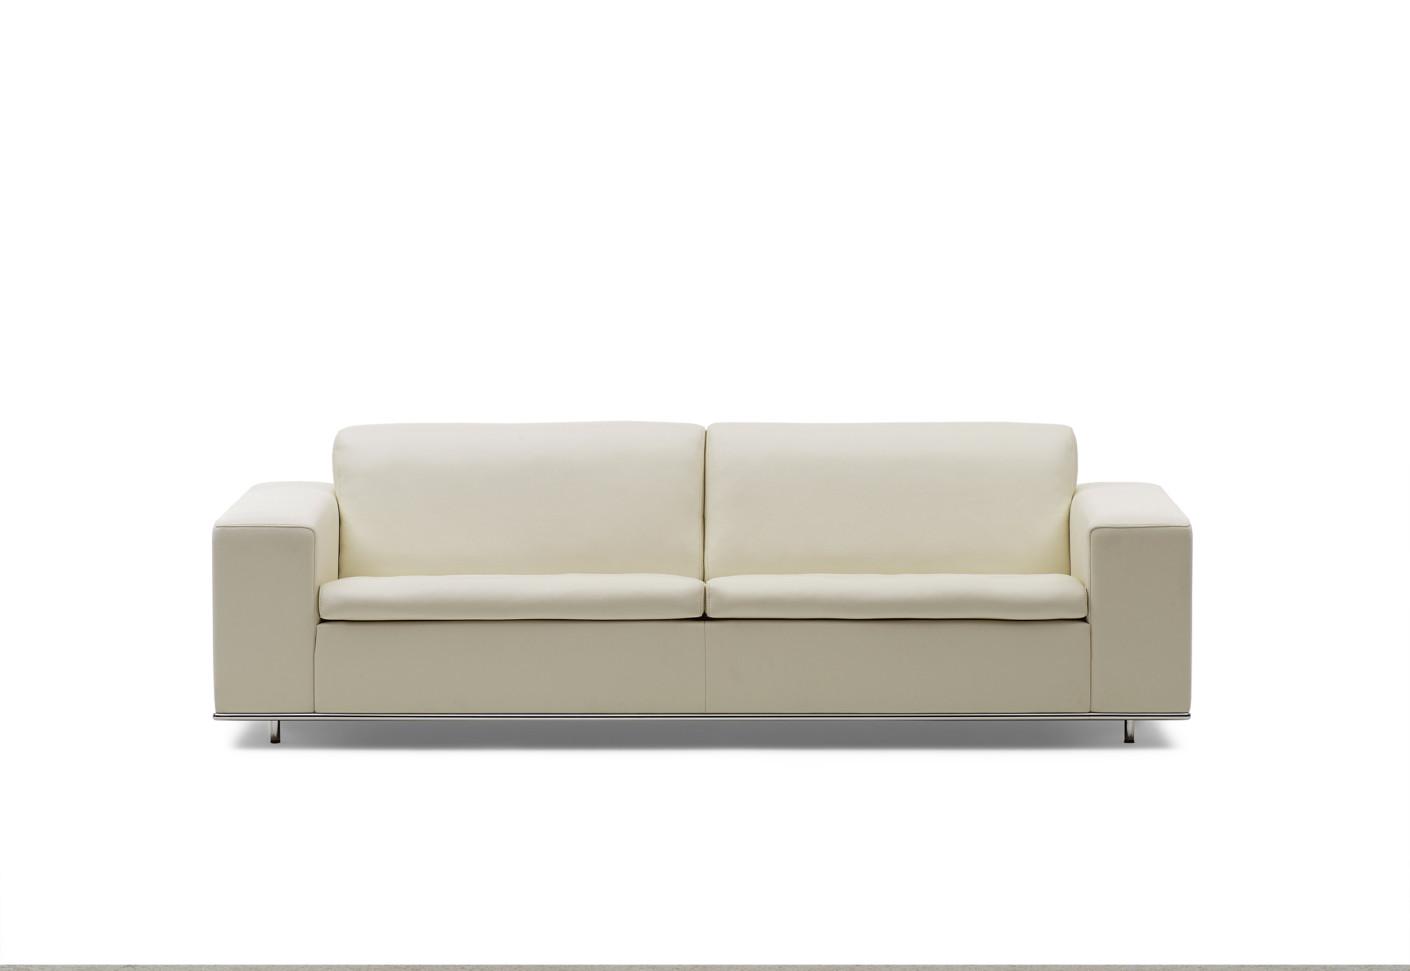 ds 3 sofa gro von de sede stylepark. Black Bedroom Furniture Sets. Home Design Ideas